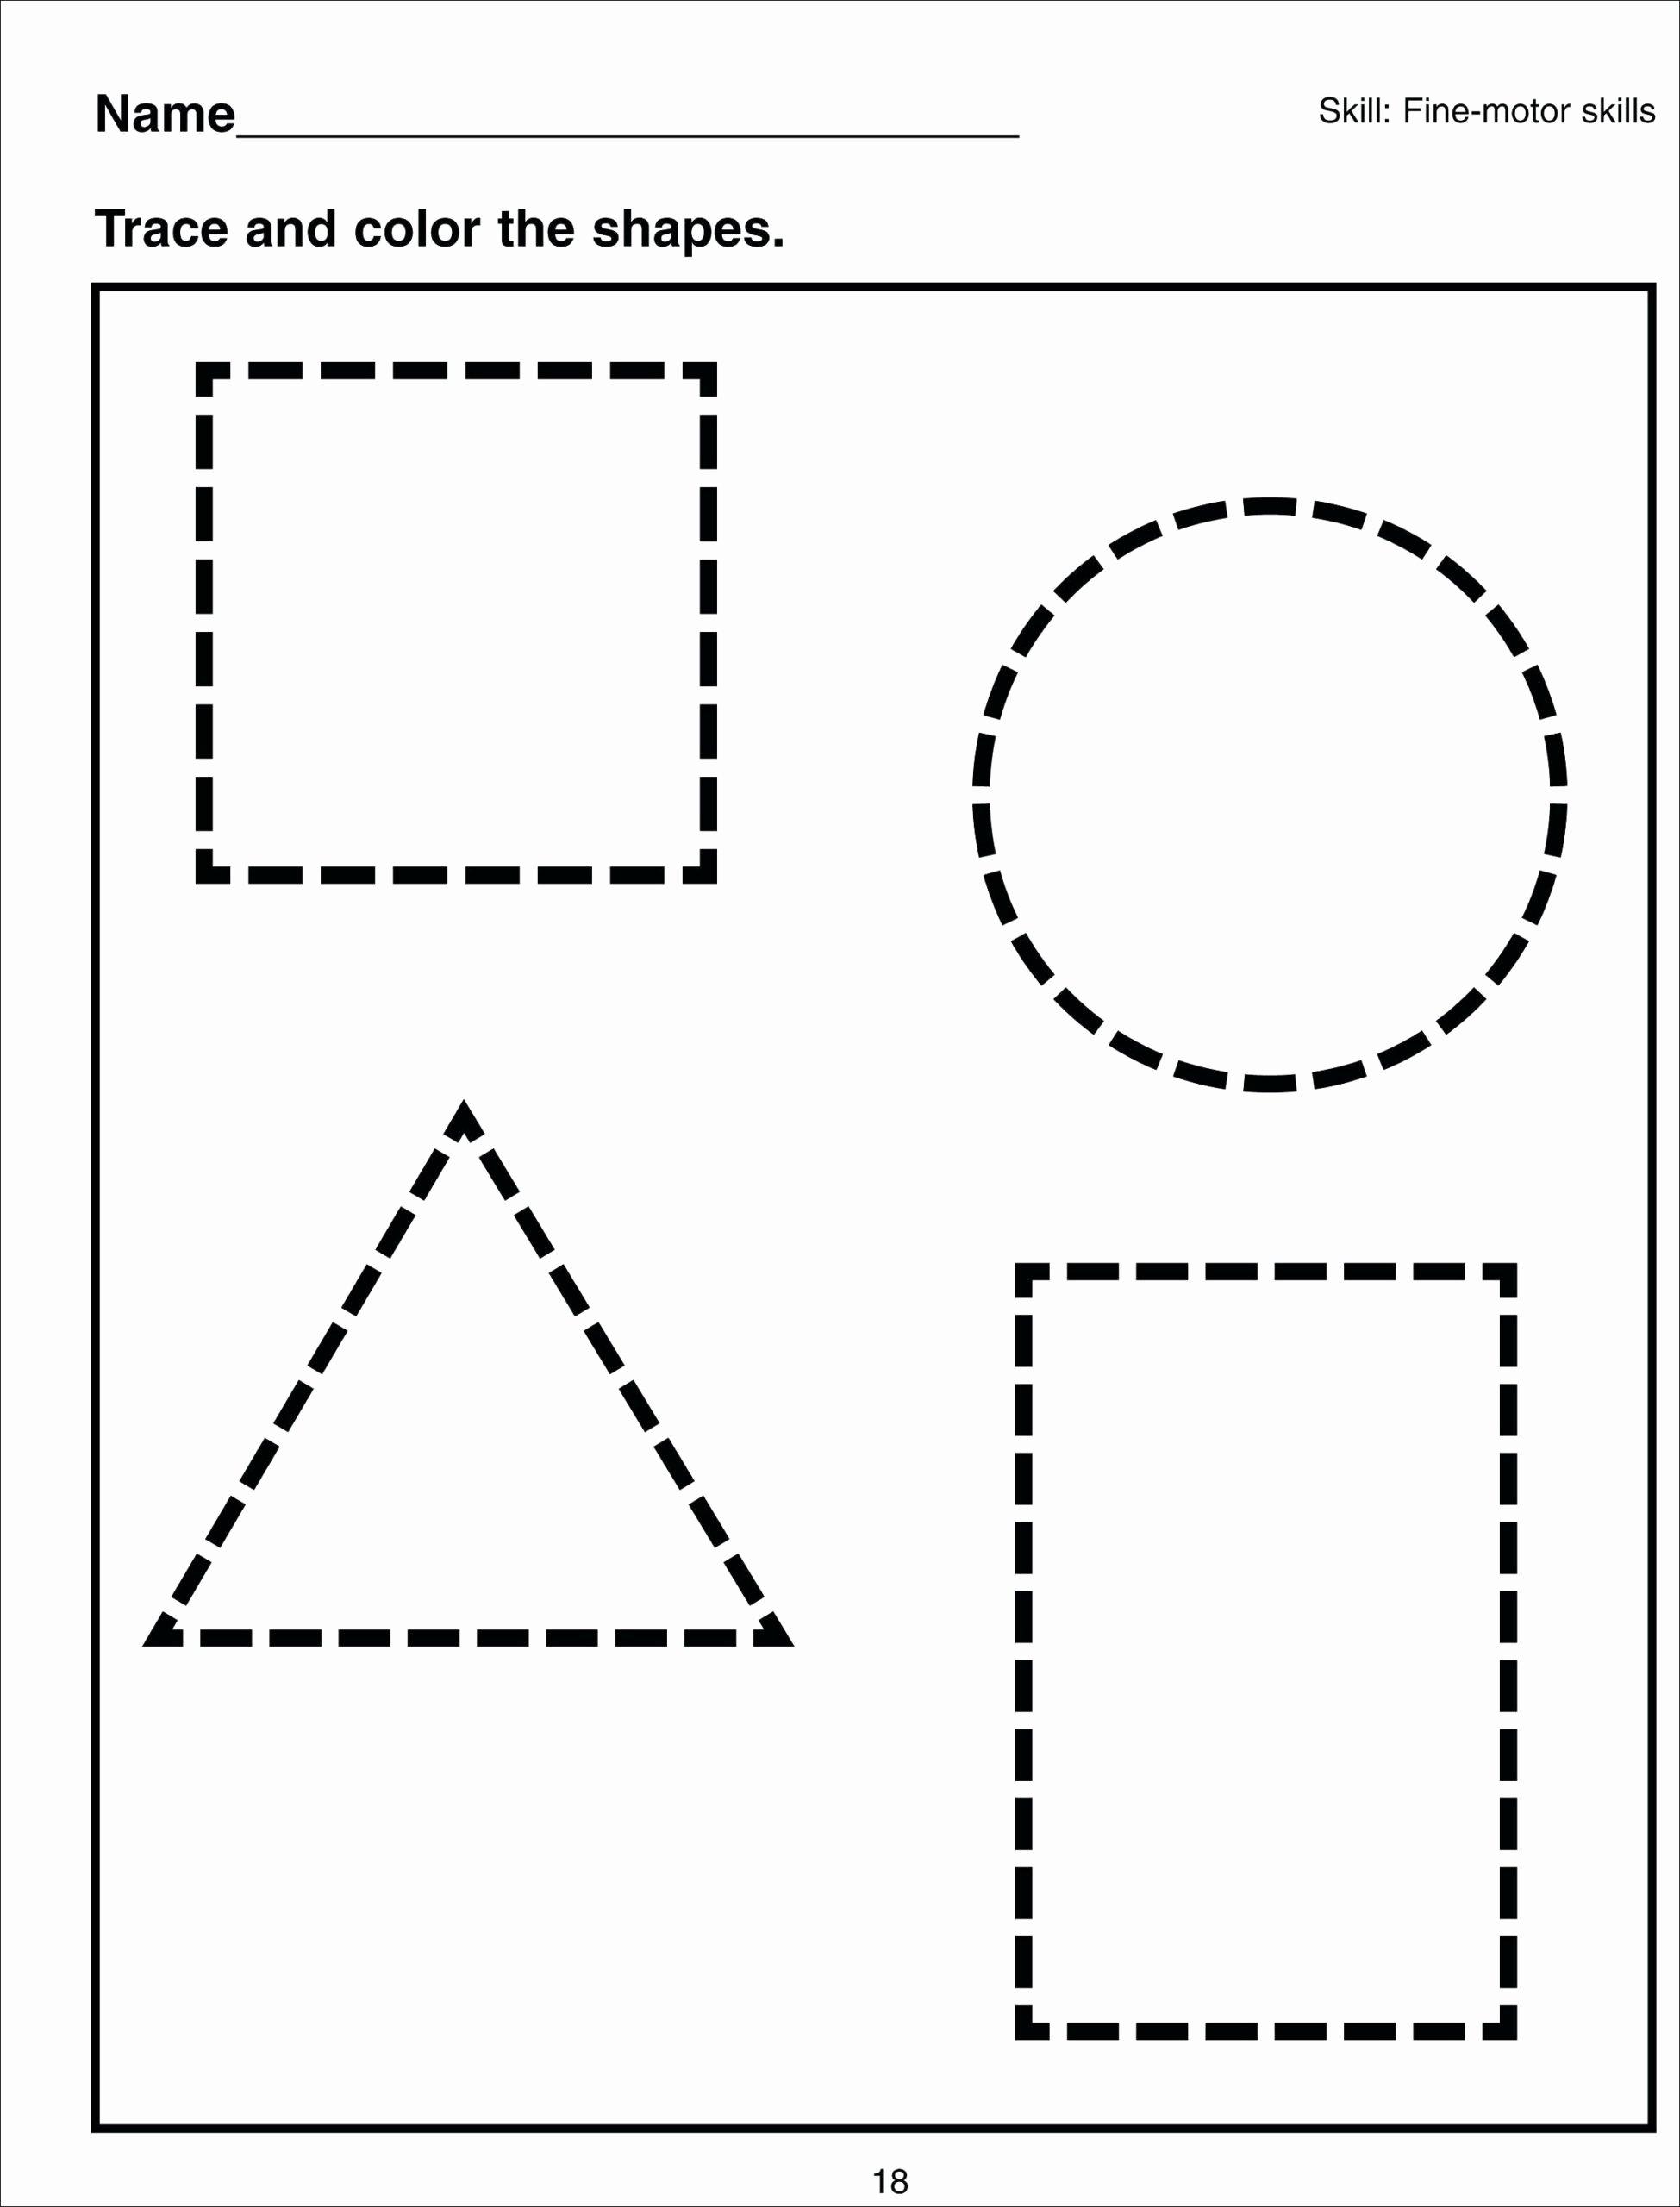 Printable Matching Worksheets for Preschoolers Fresh Math Worksheet Preschool Memory Match Great Family Games